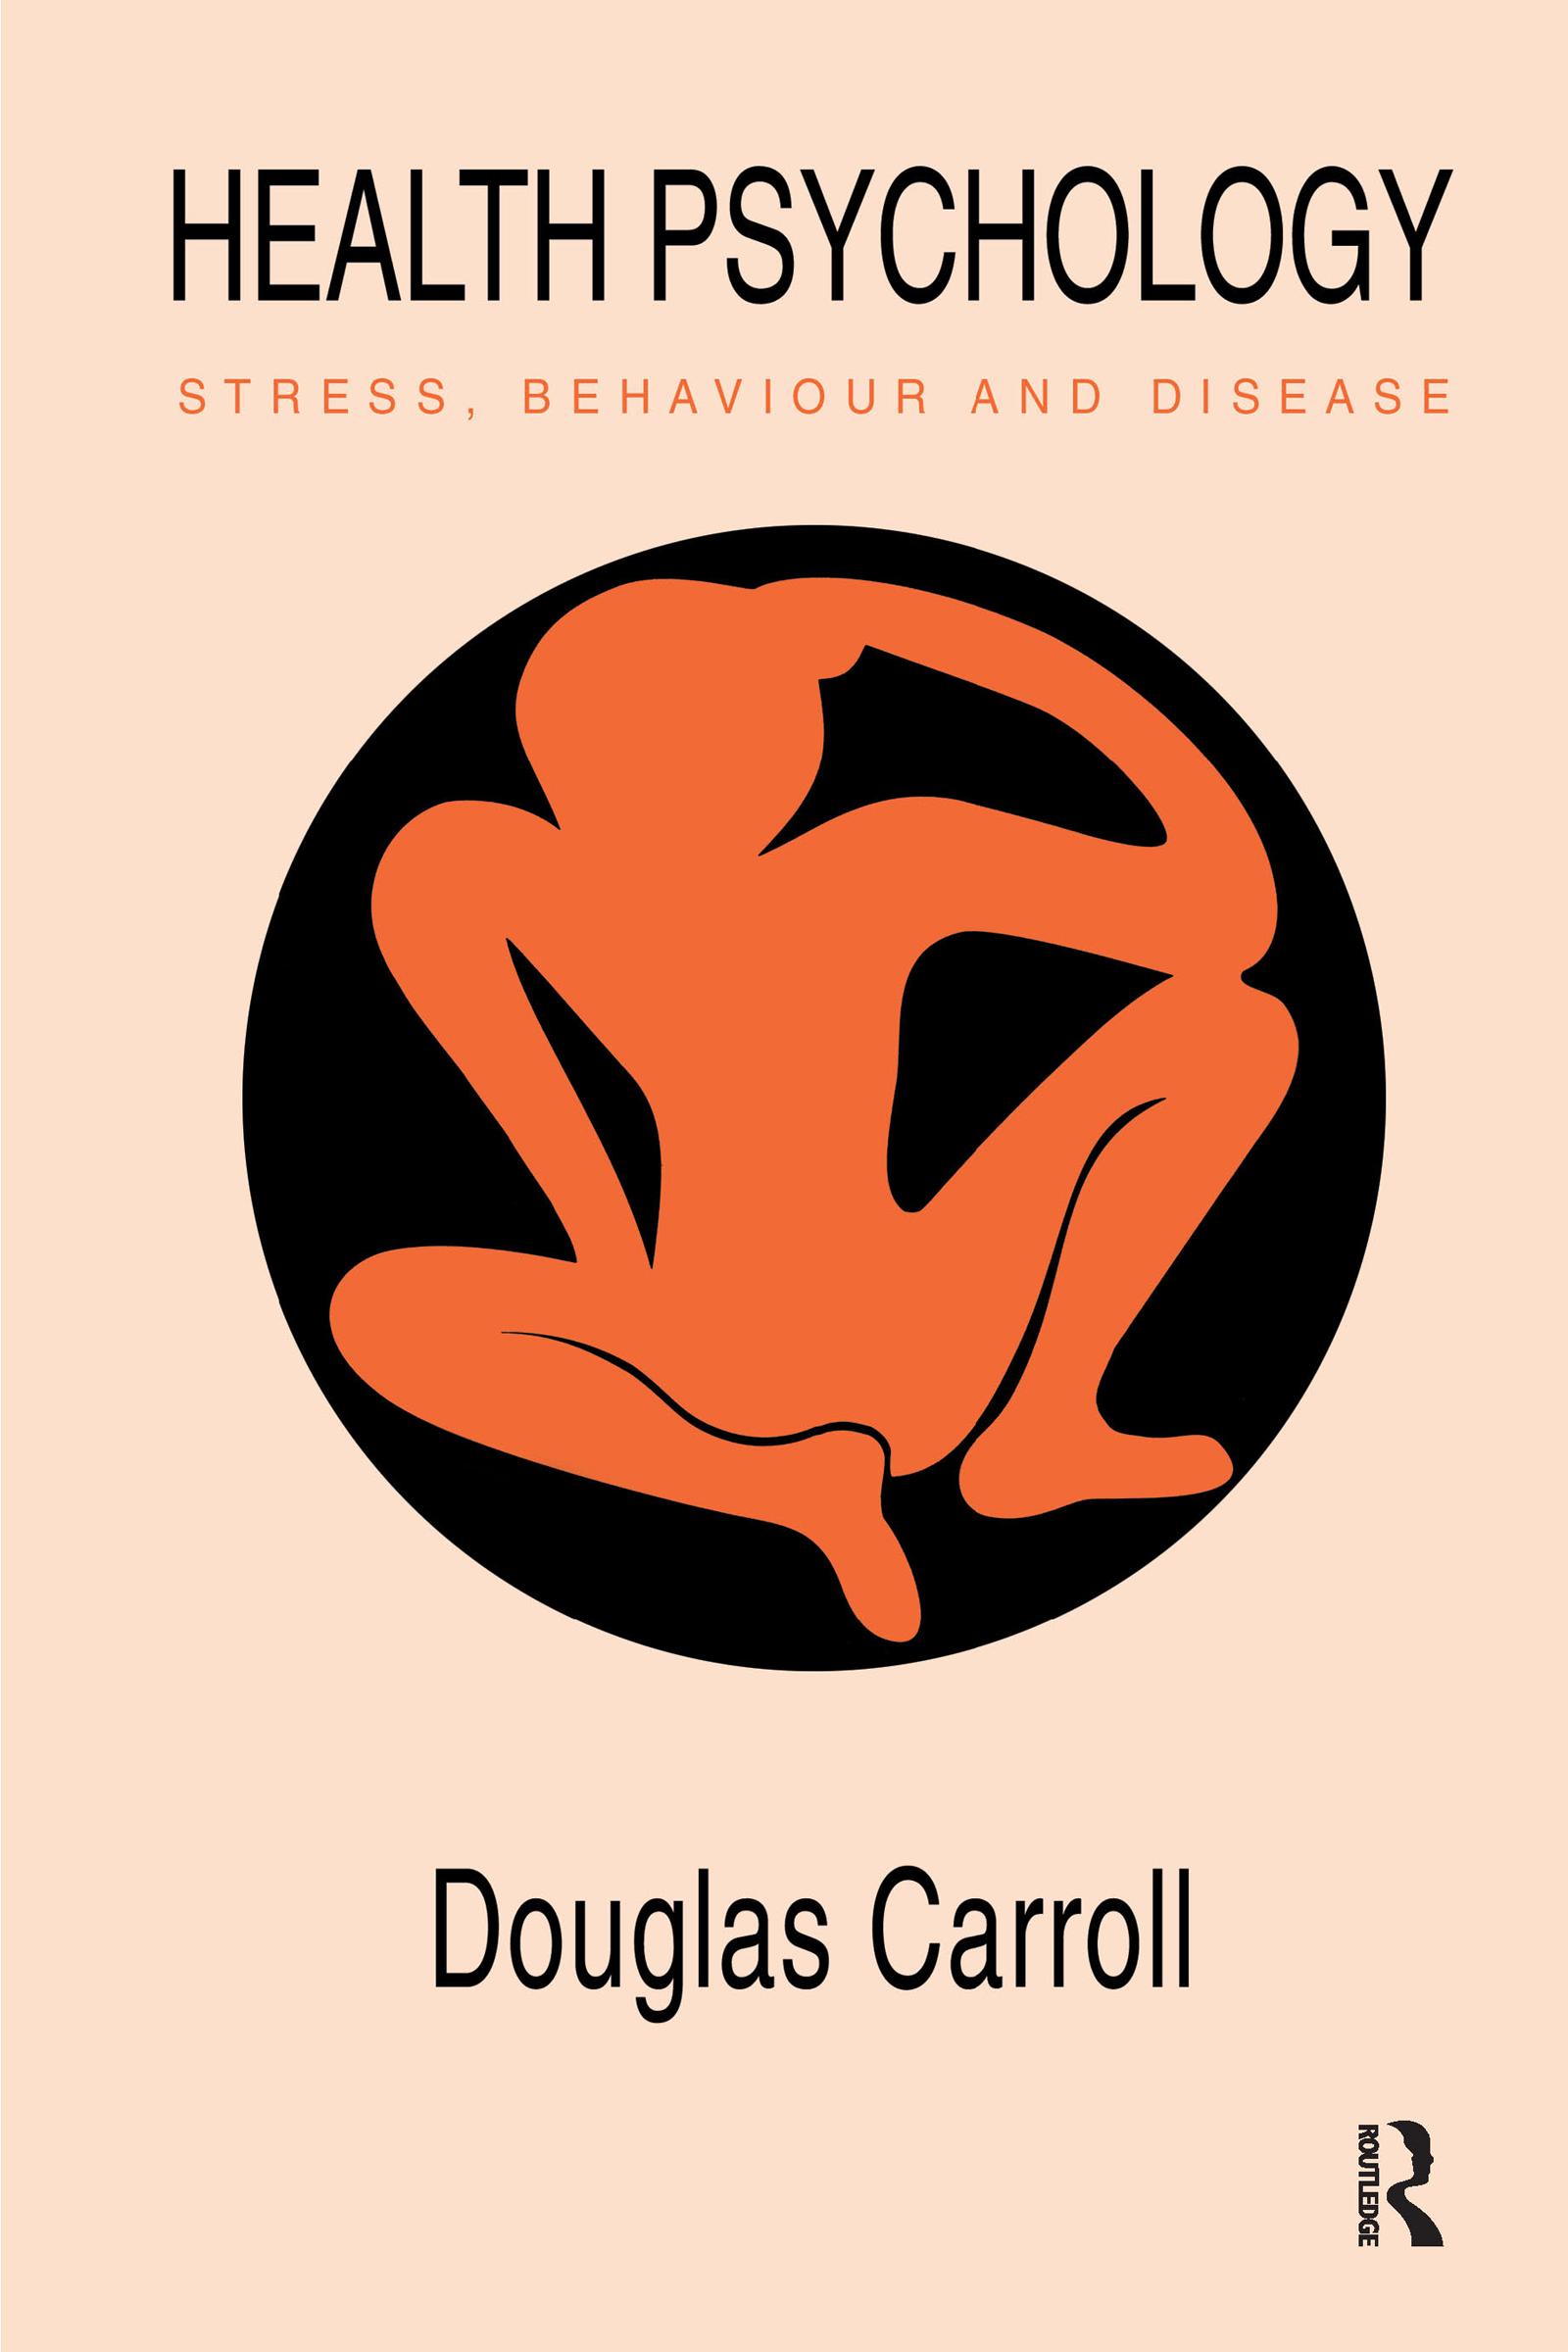 Health Psychology: Stress, Behaviour And Disease